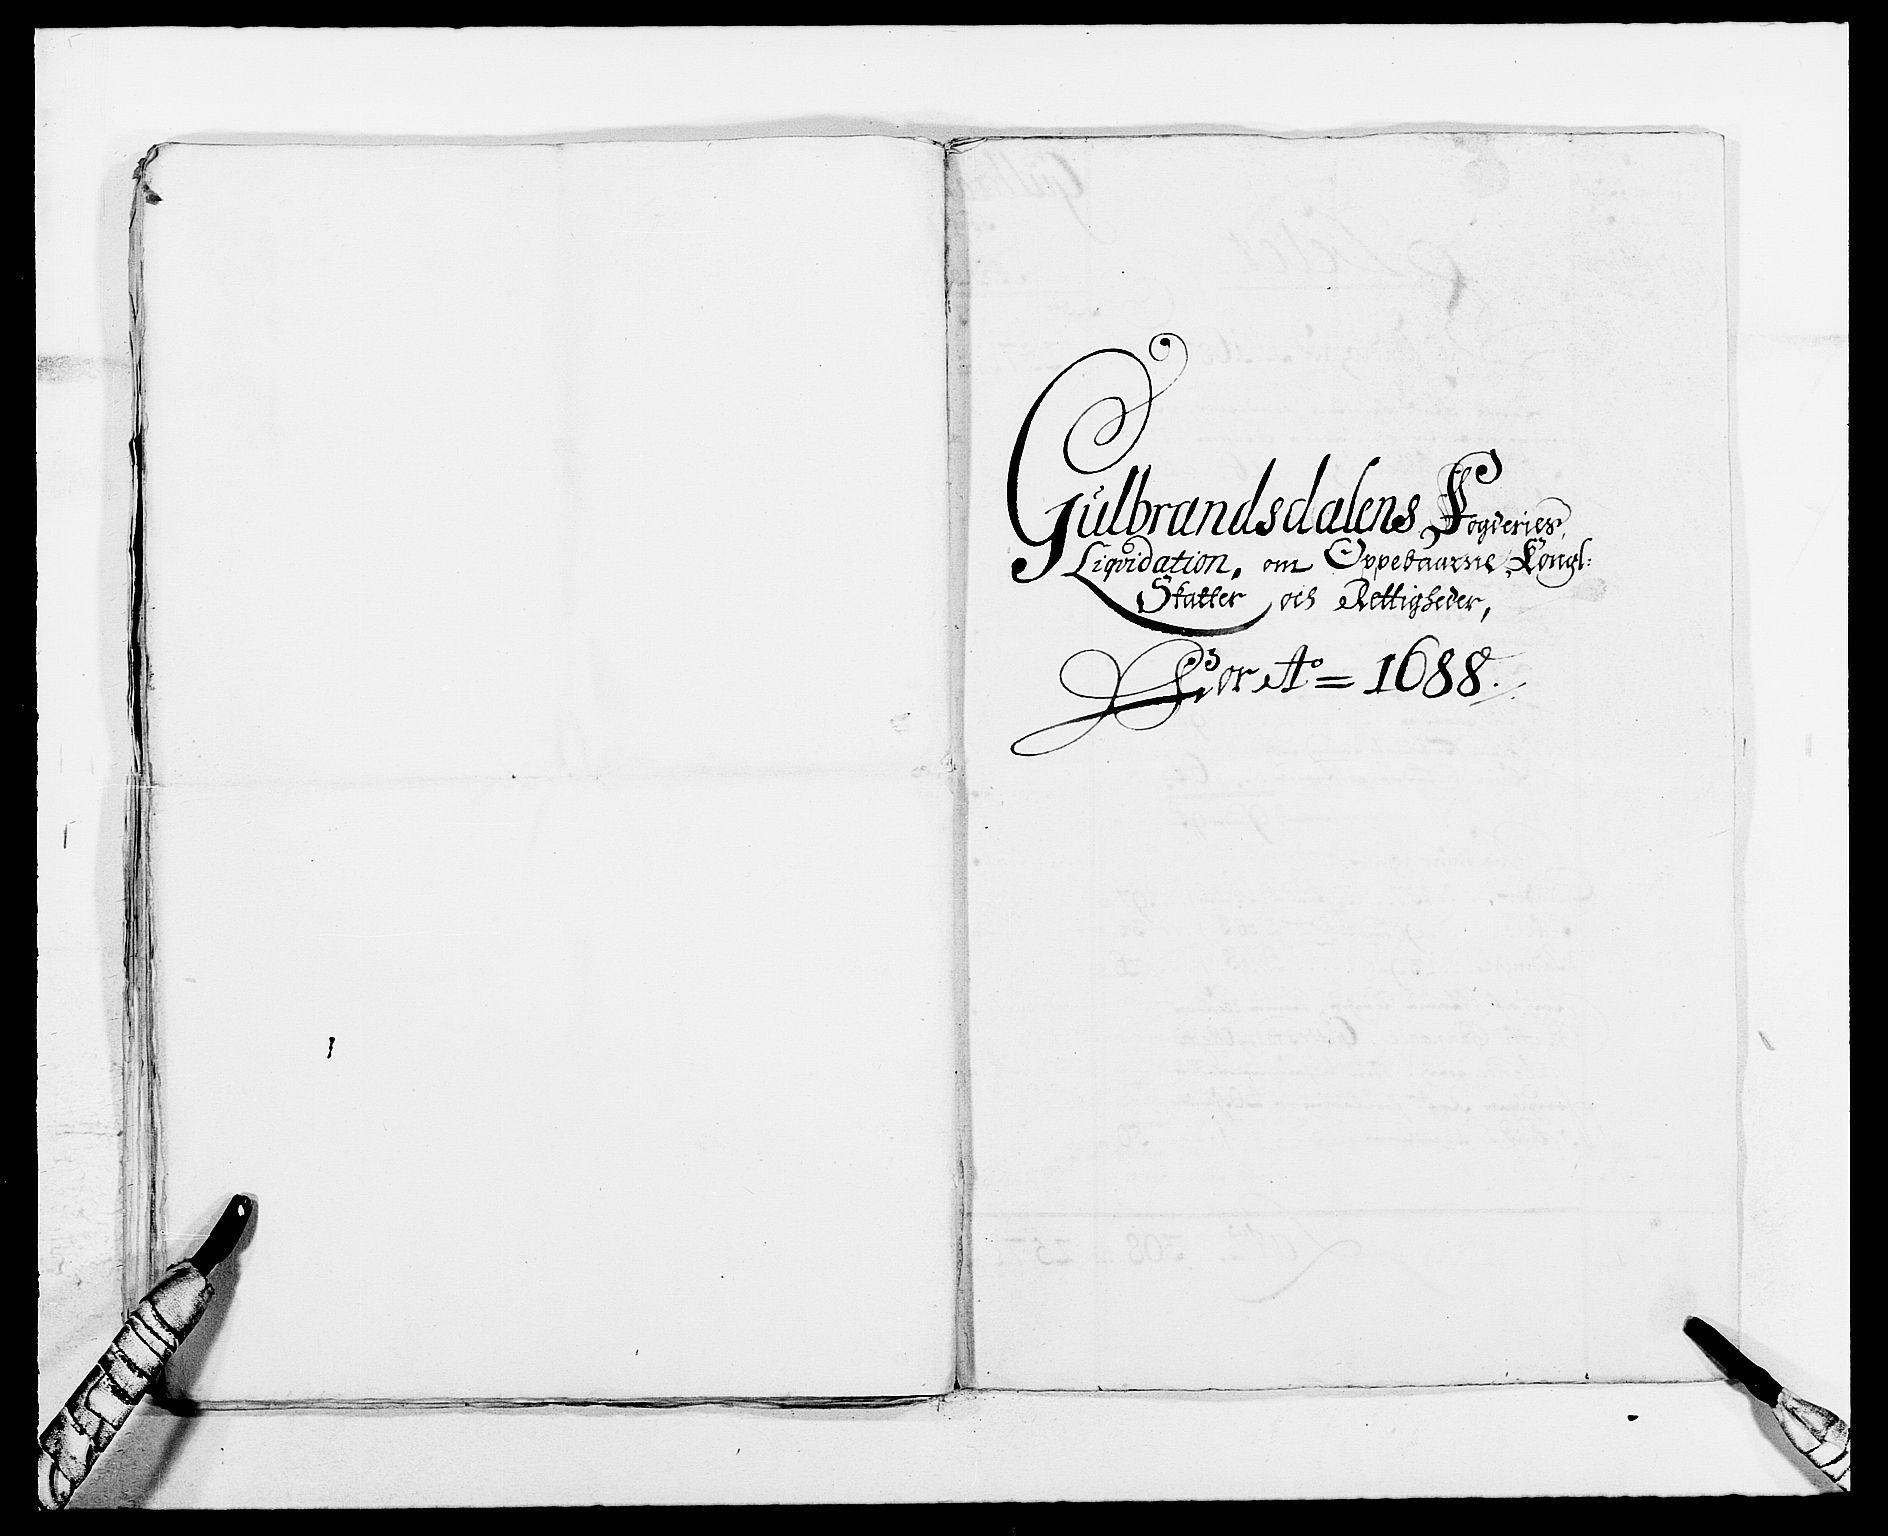 RA, Rentekammeret inntil 1814, Reviderte regnskaper, Fogderegnskap, R17/L1157: Fogderegnskap Gudbrandsdal, 1682-1689, s. 30